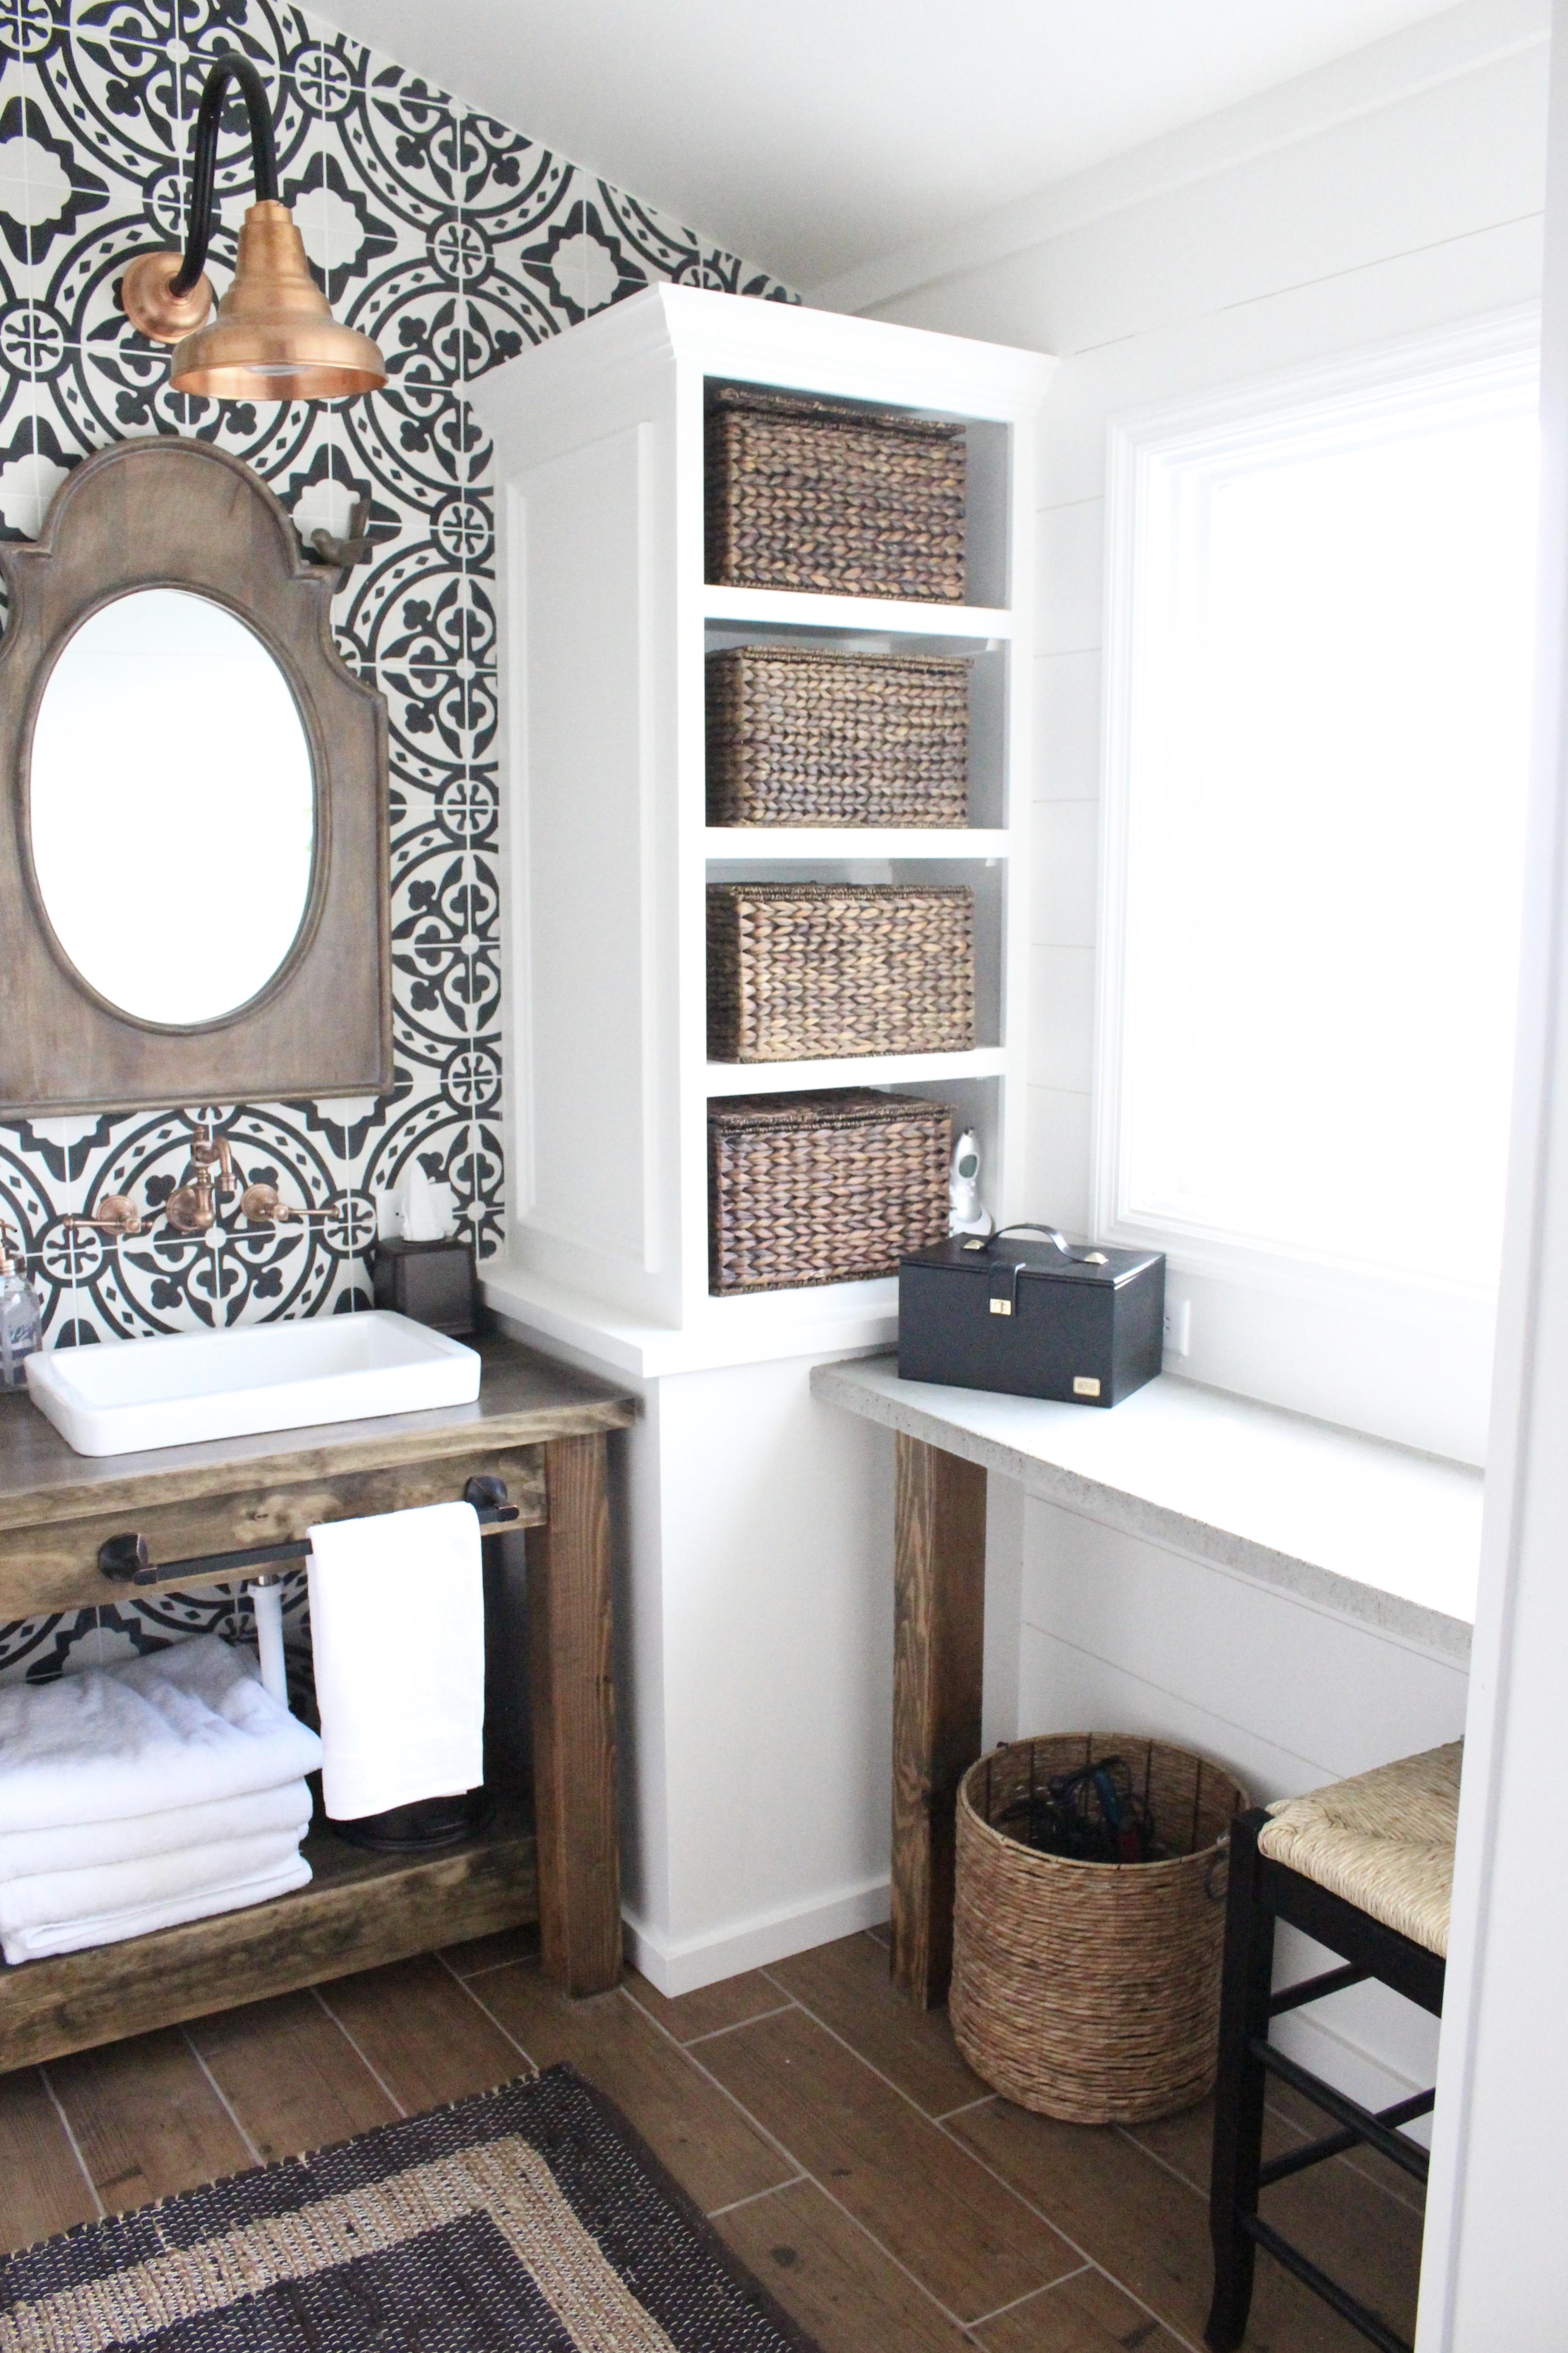 Modern Farmhouse Bathroom Remodel Reveal | White Cottage ... on Bathroom Ideas Modern Farmhouse  id=24791